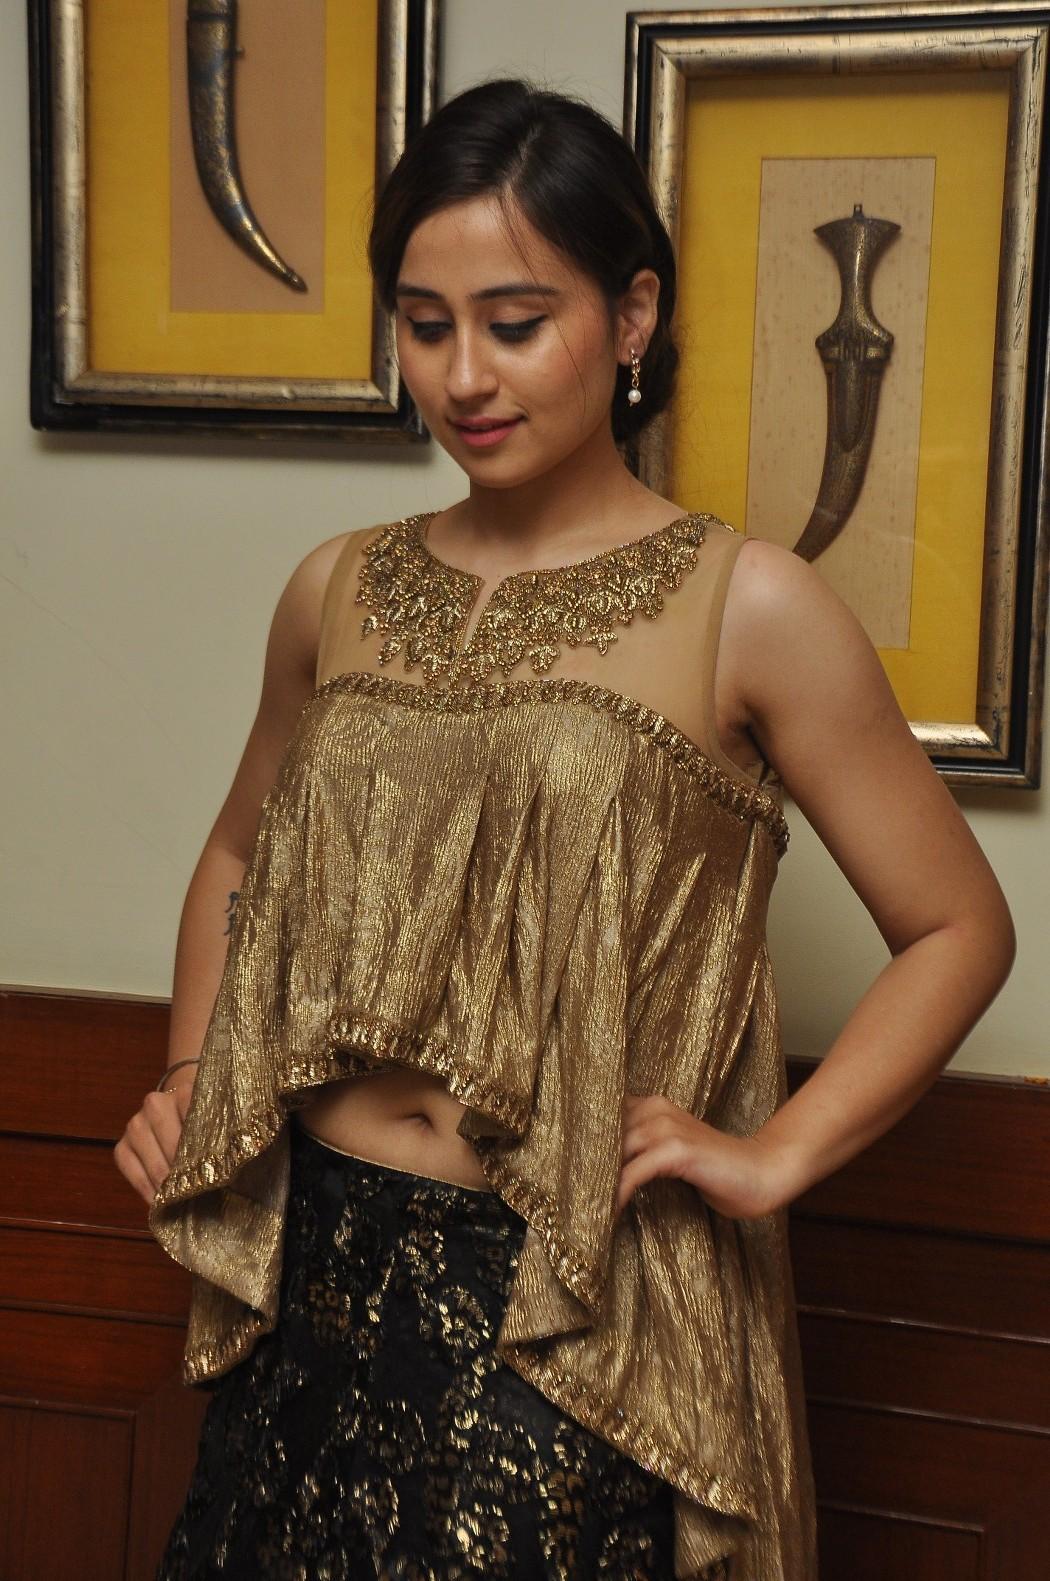 Love For Handloom Celebs and Models Dazzle In Elegant Outfit   Love For Handloom Praneetha Love For Handloom 475